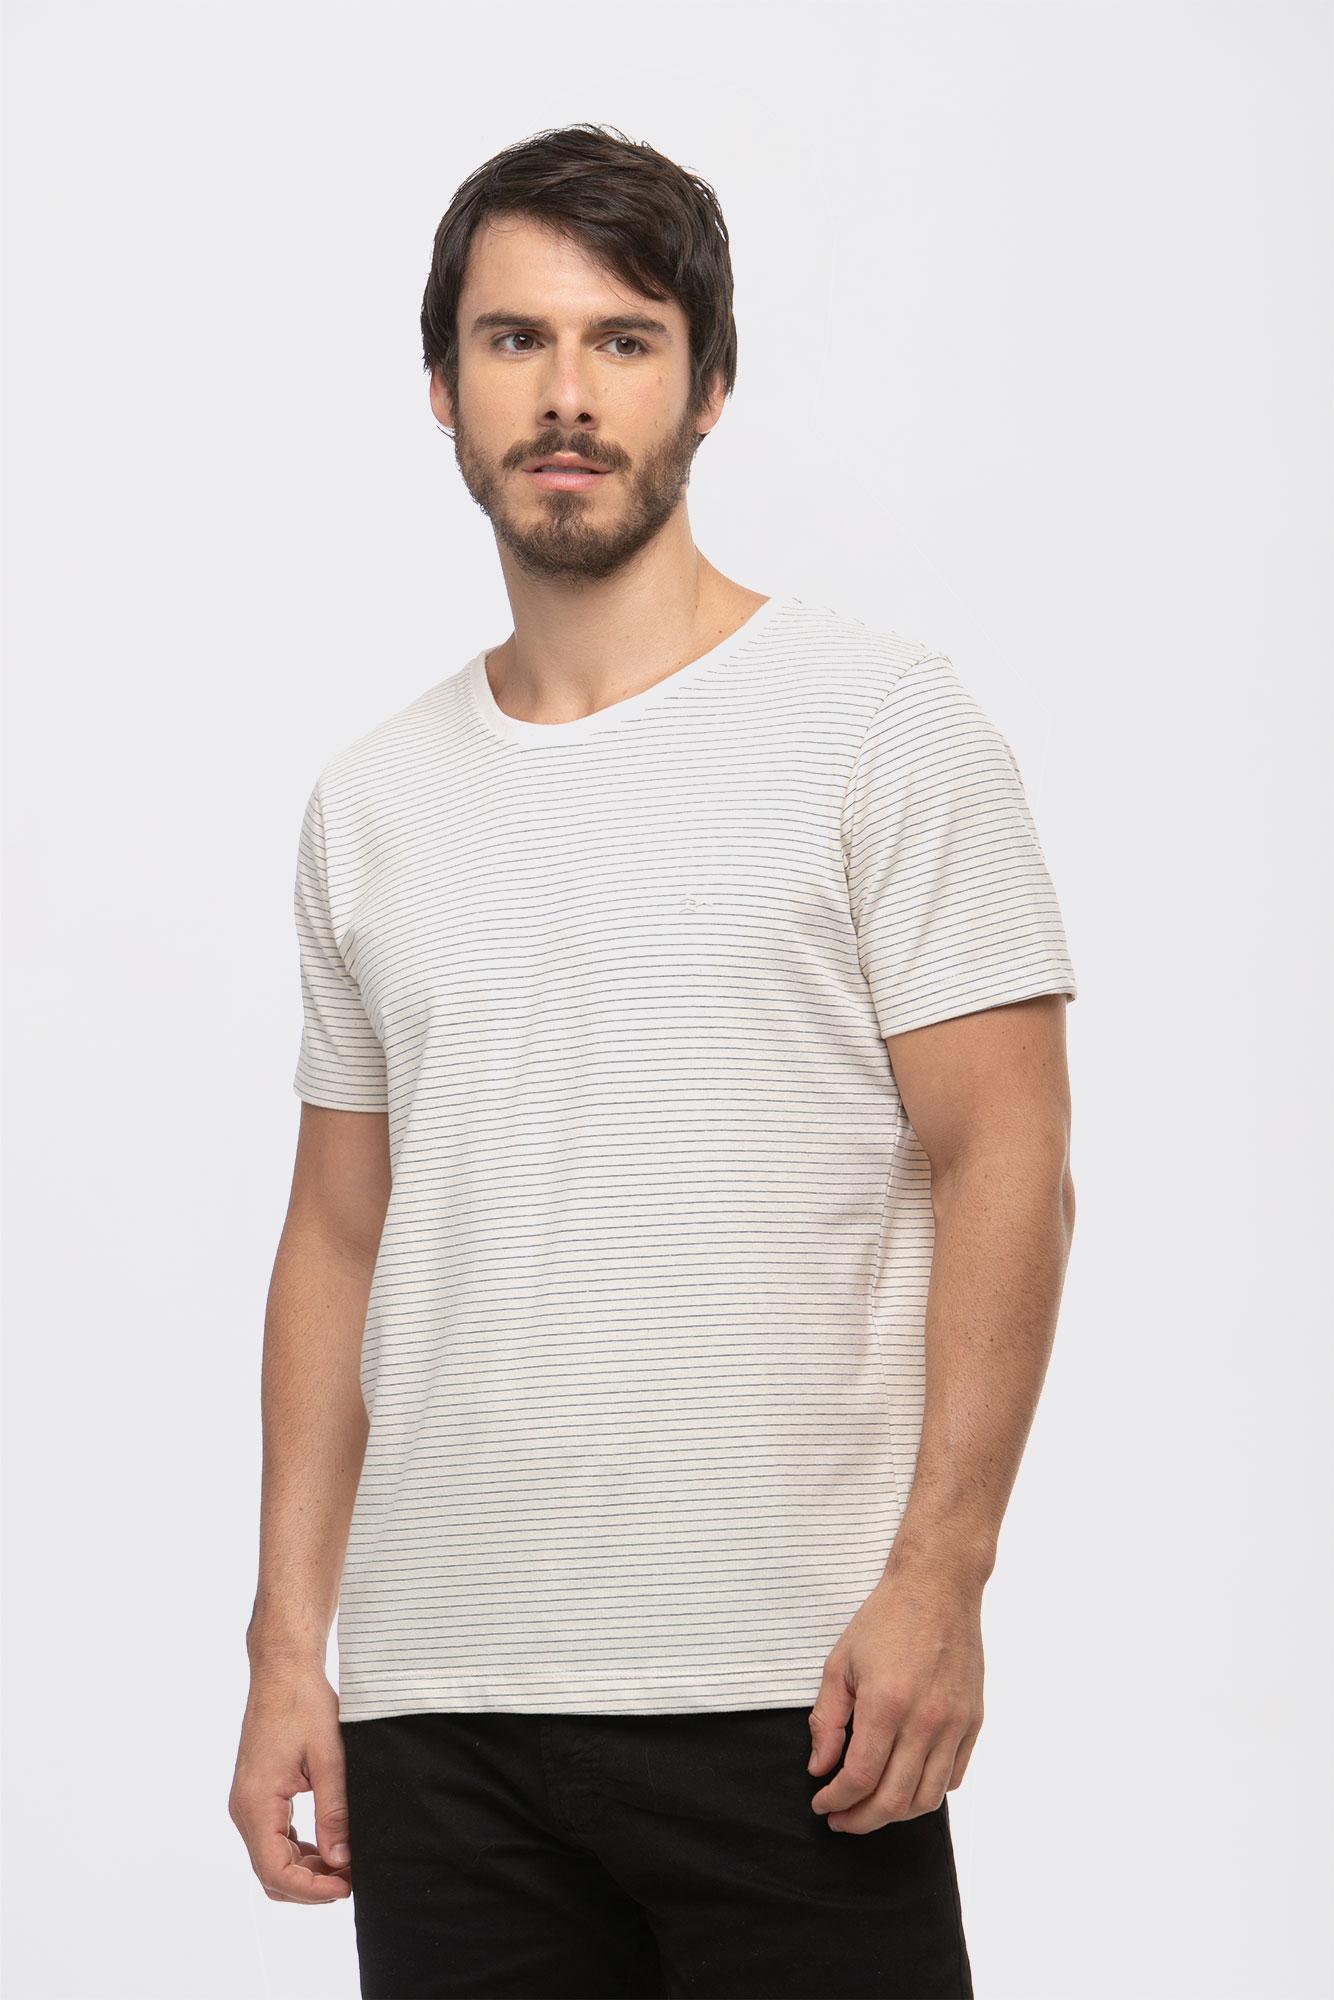 Camiseta Listrada Craft Natural